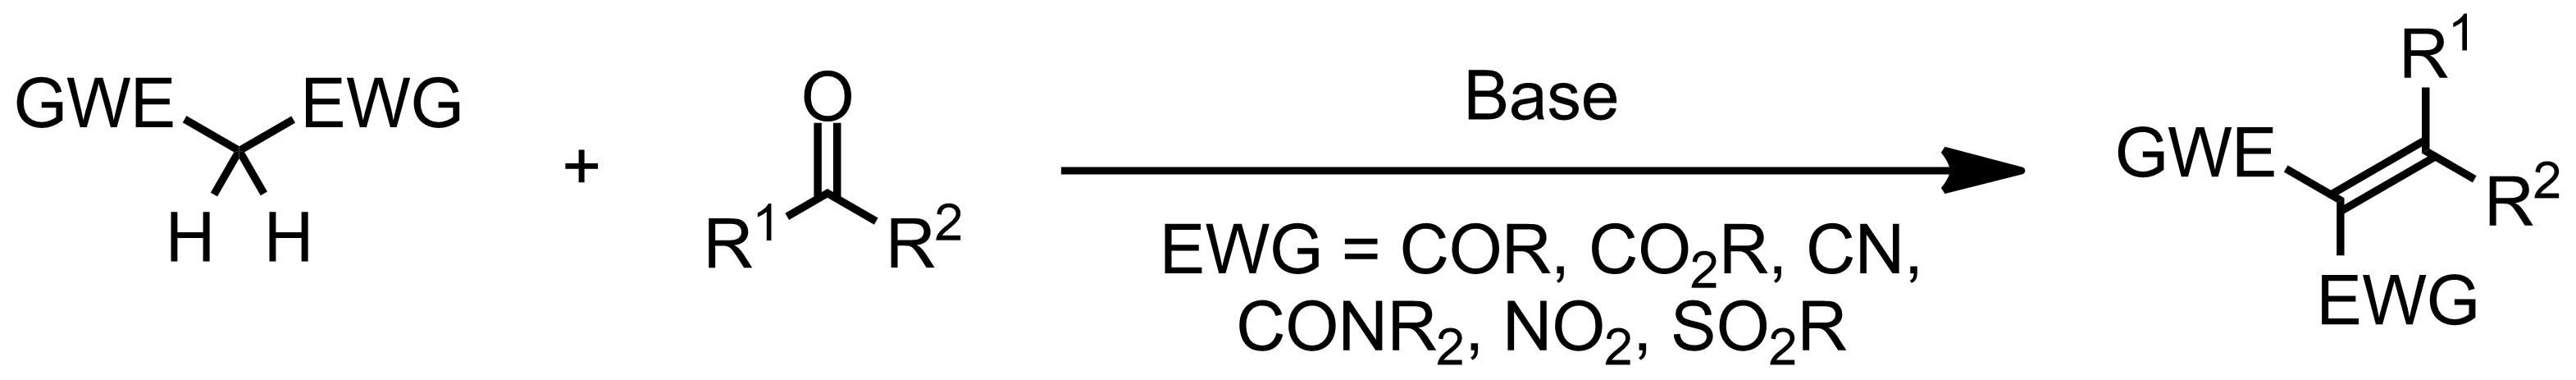 Schematic representation of the Knoevenagel Condensation.